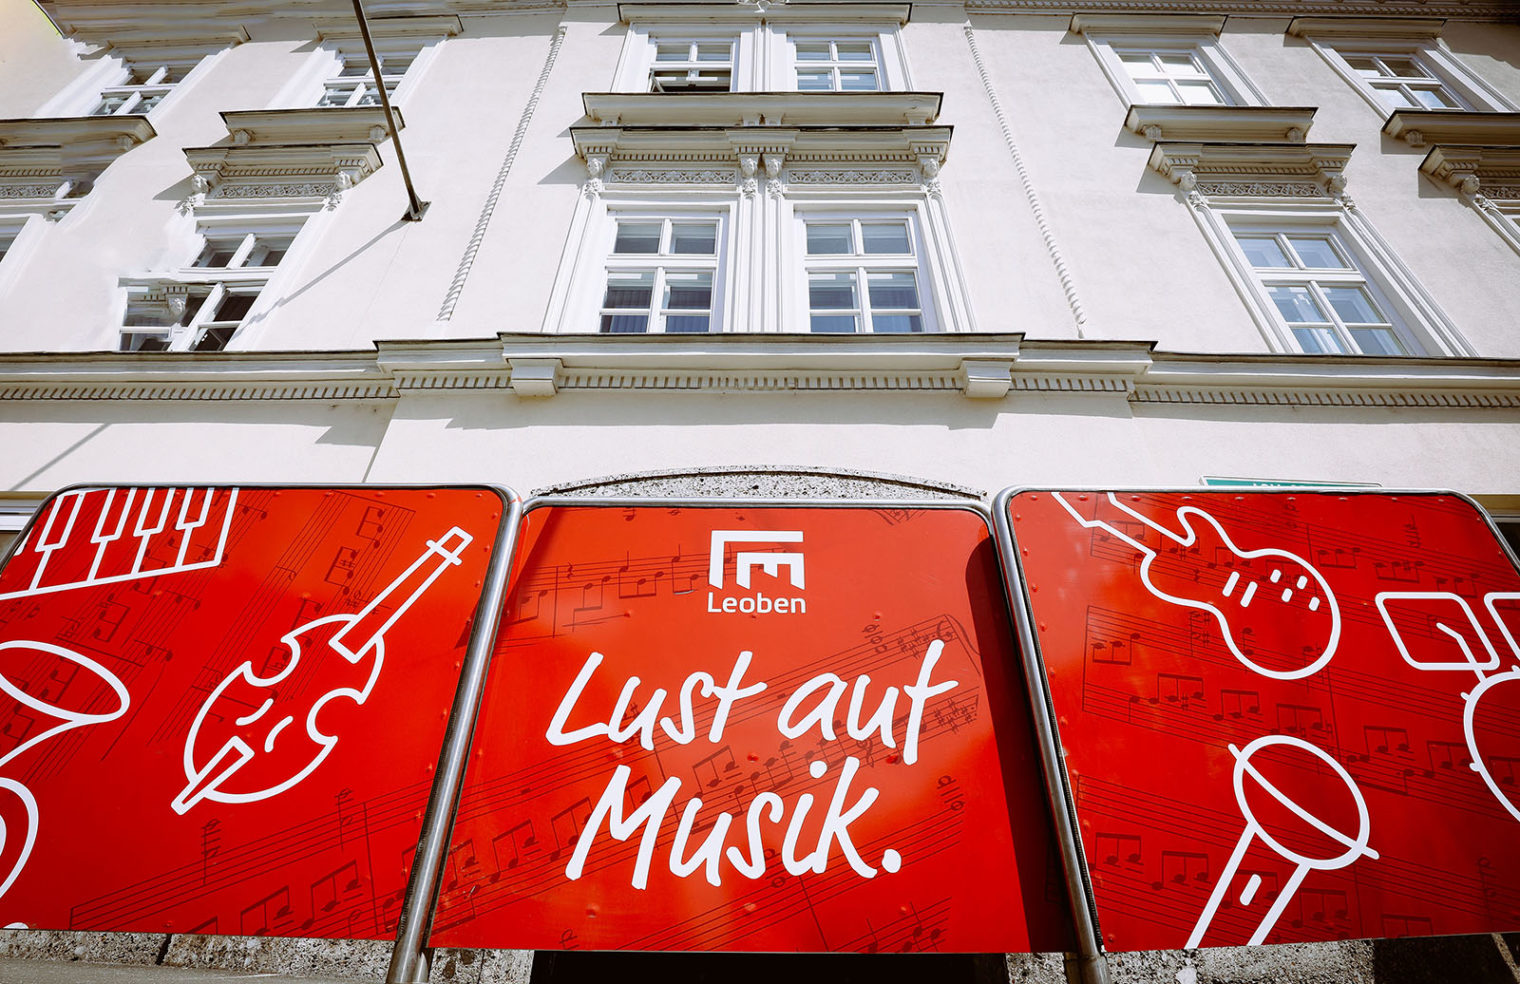 Eingang der Musikschule Leoben